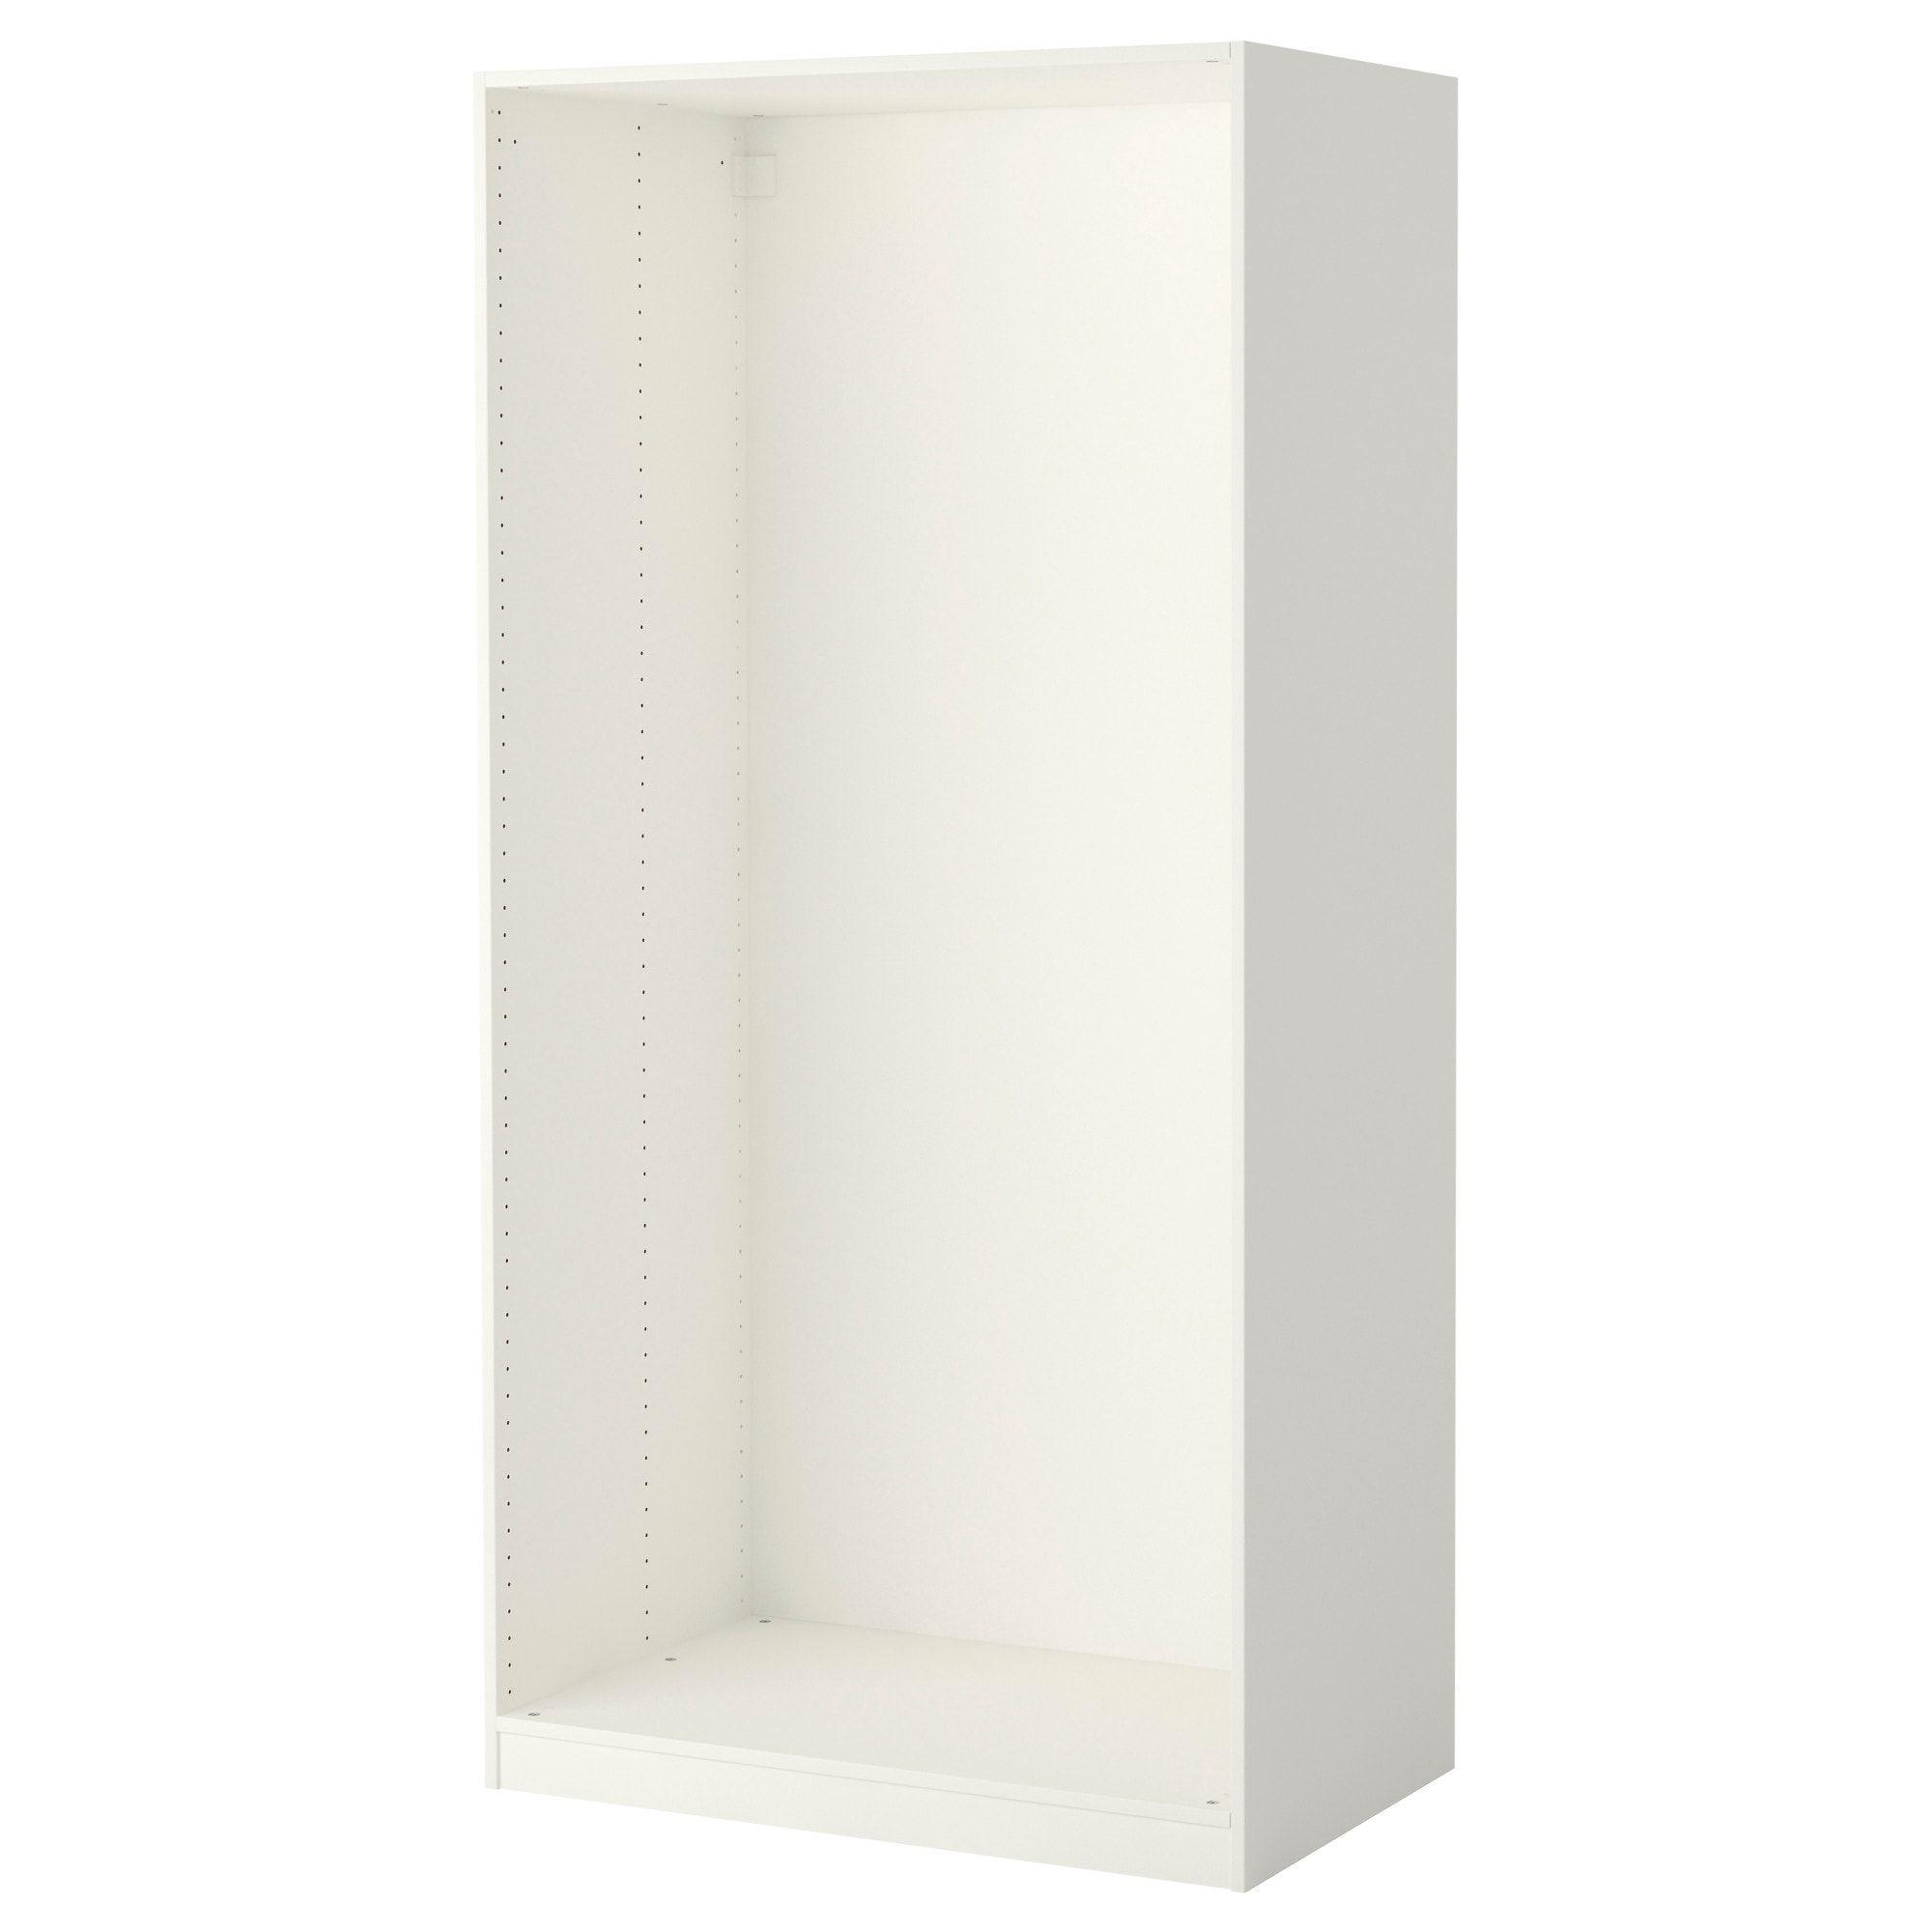 Pax Wardrobe Frame White 39 3 8x22 7 8x79 1 8 Ikea Pax Wardrobe Ikea Pax Wardrobe Ikea Pax